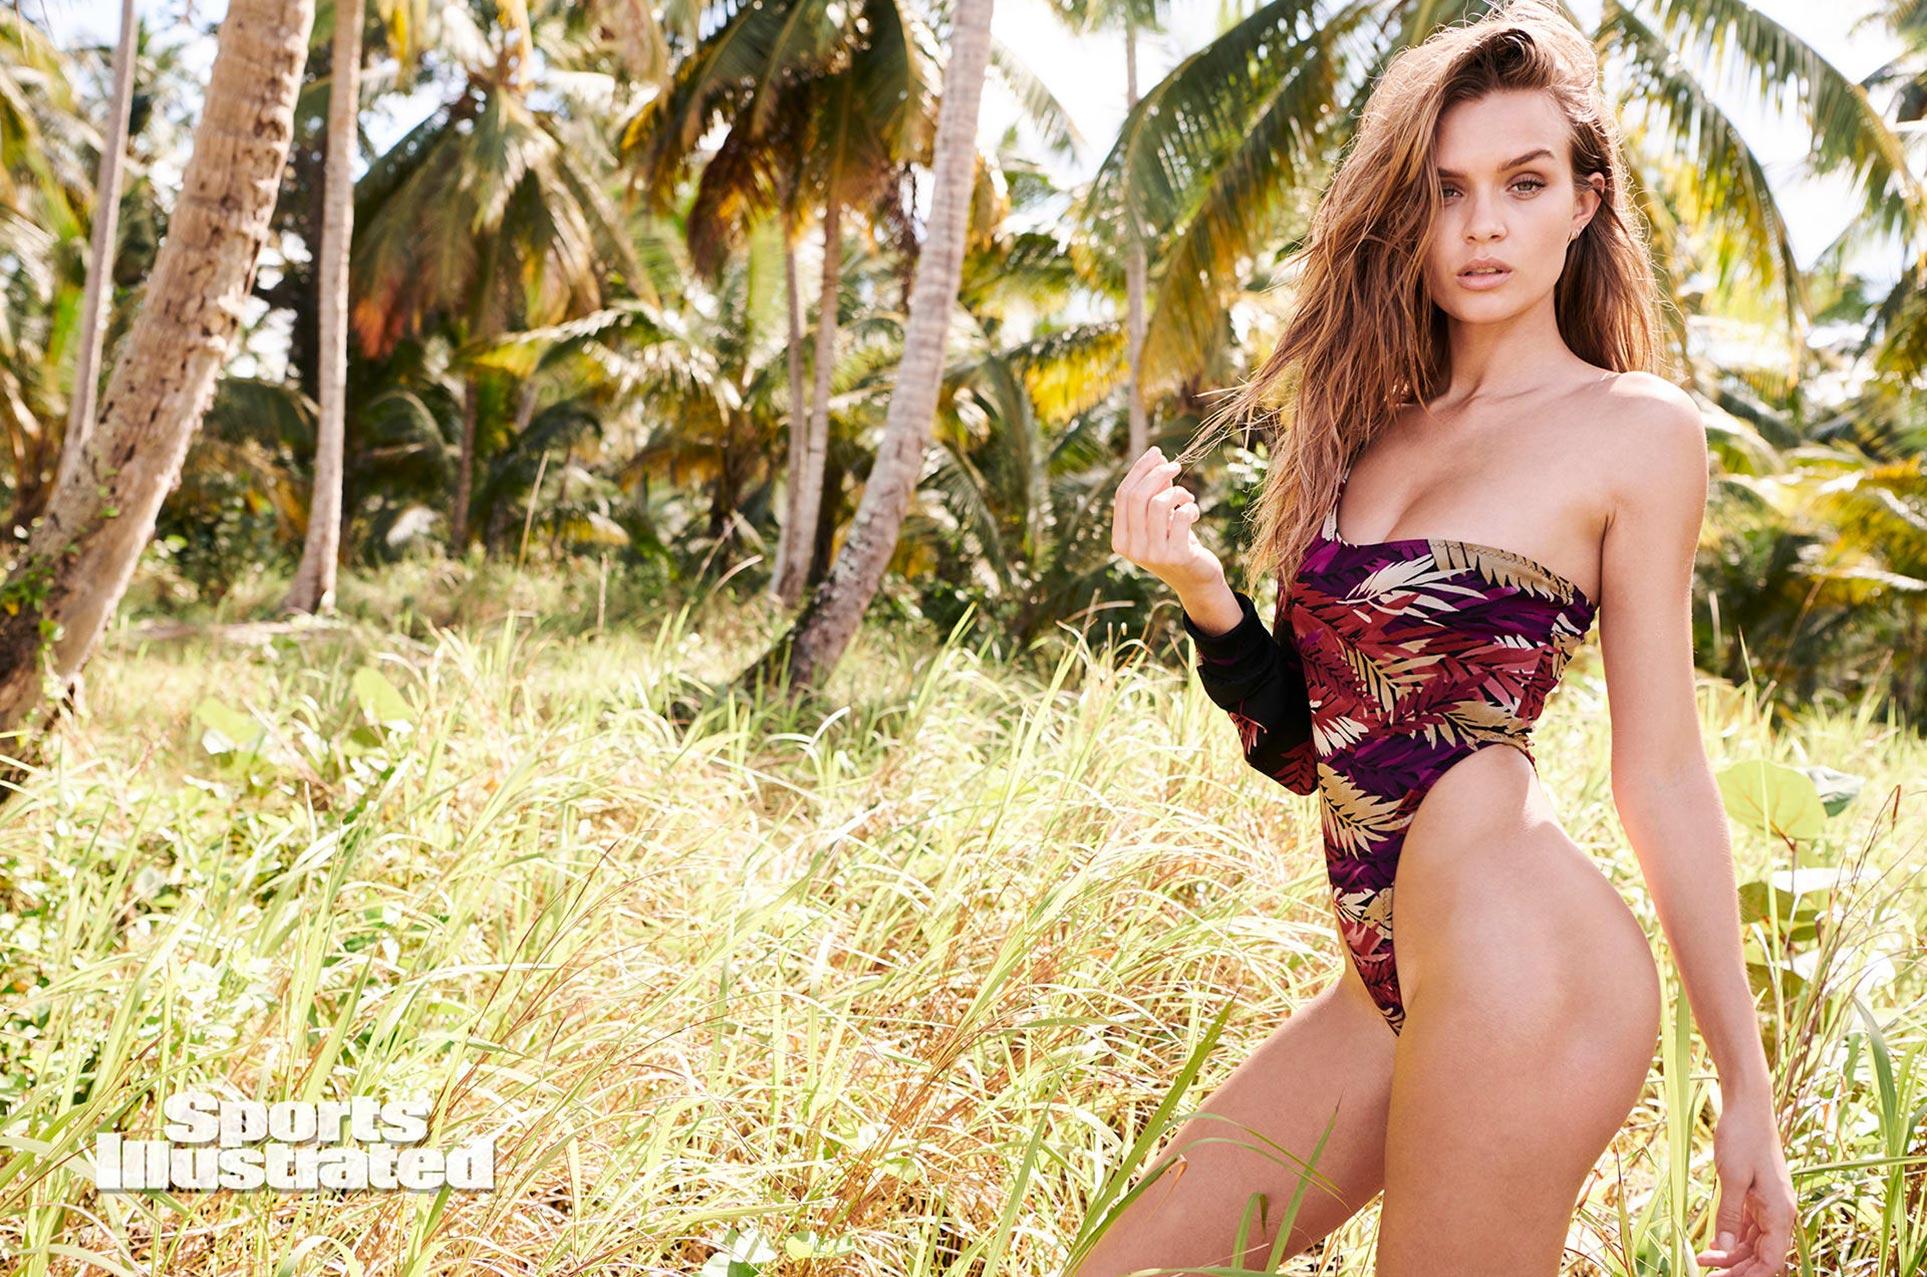 Жозефин Скривер в каталоге купальников Sports Illustrated Swimsuit 2020 / фото 07